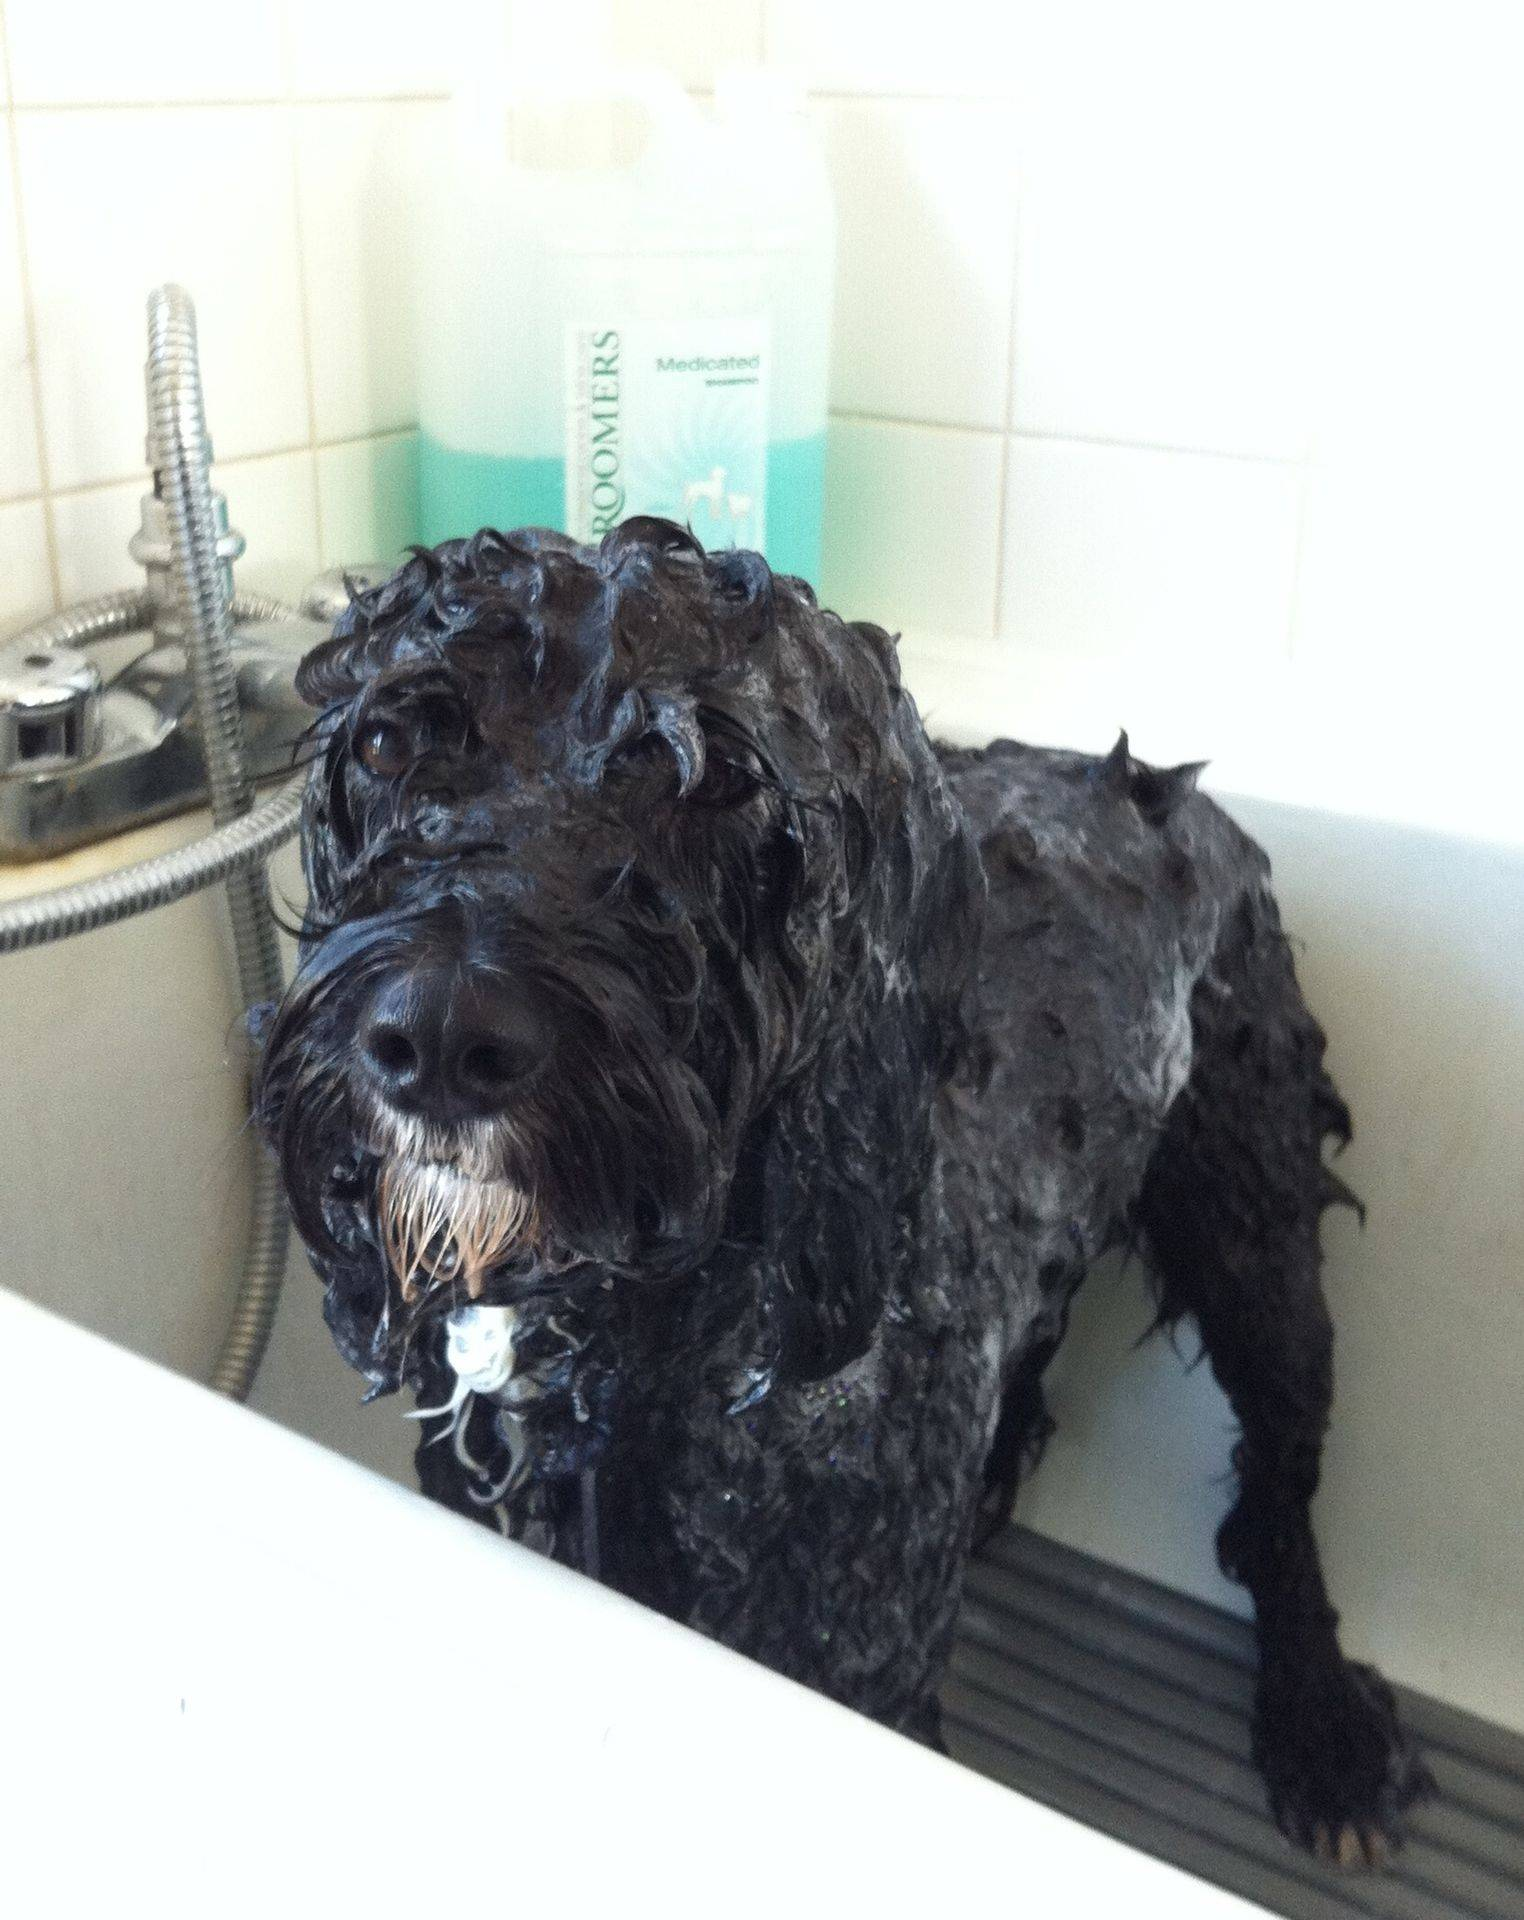 Charlie - CockerPoo. Bath time at Vickys Dog Care